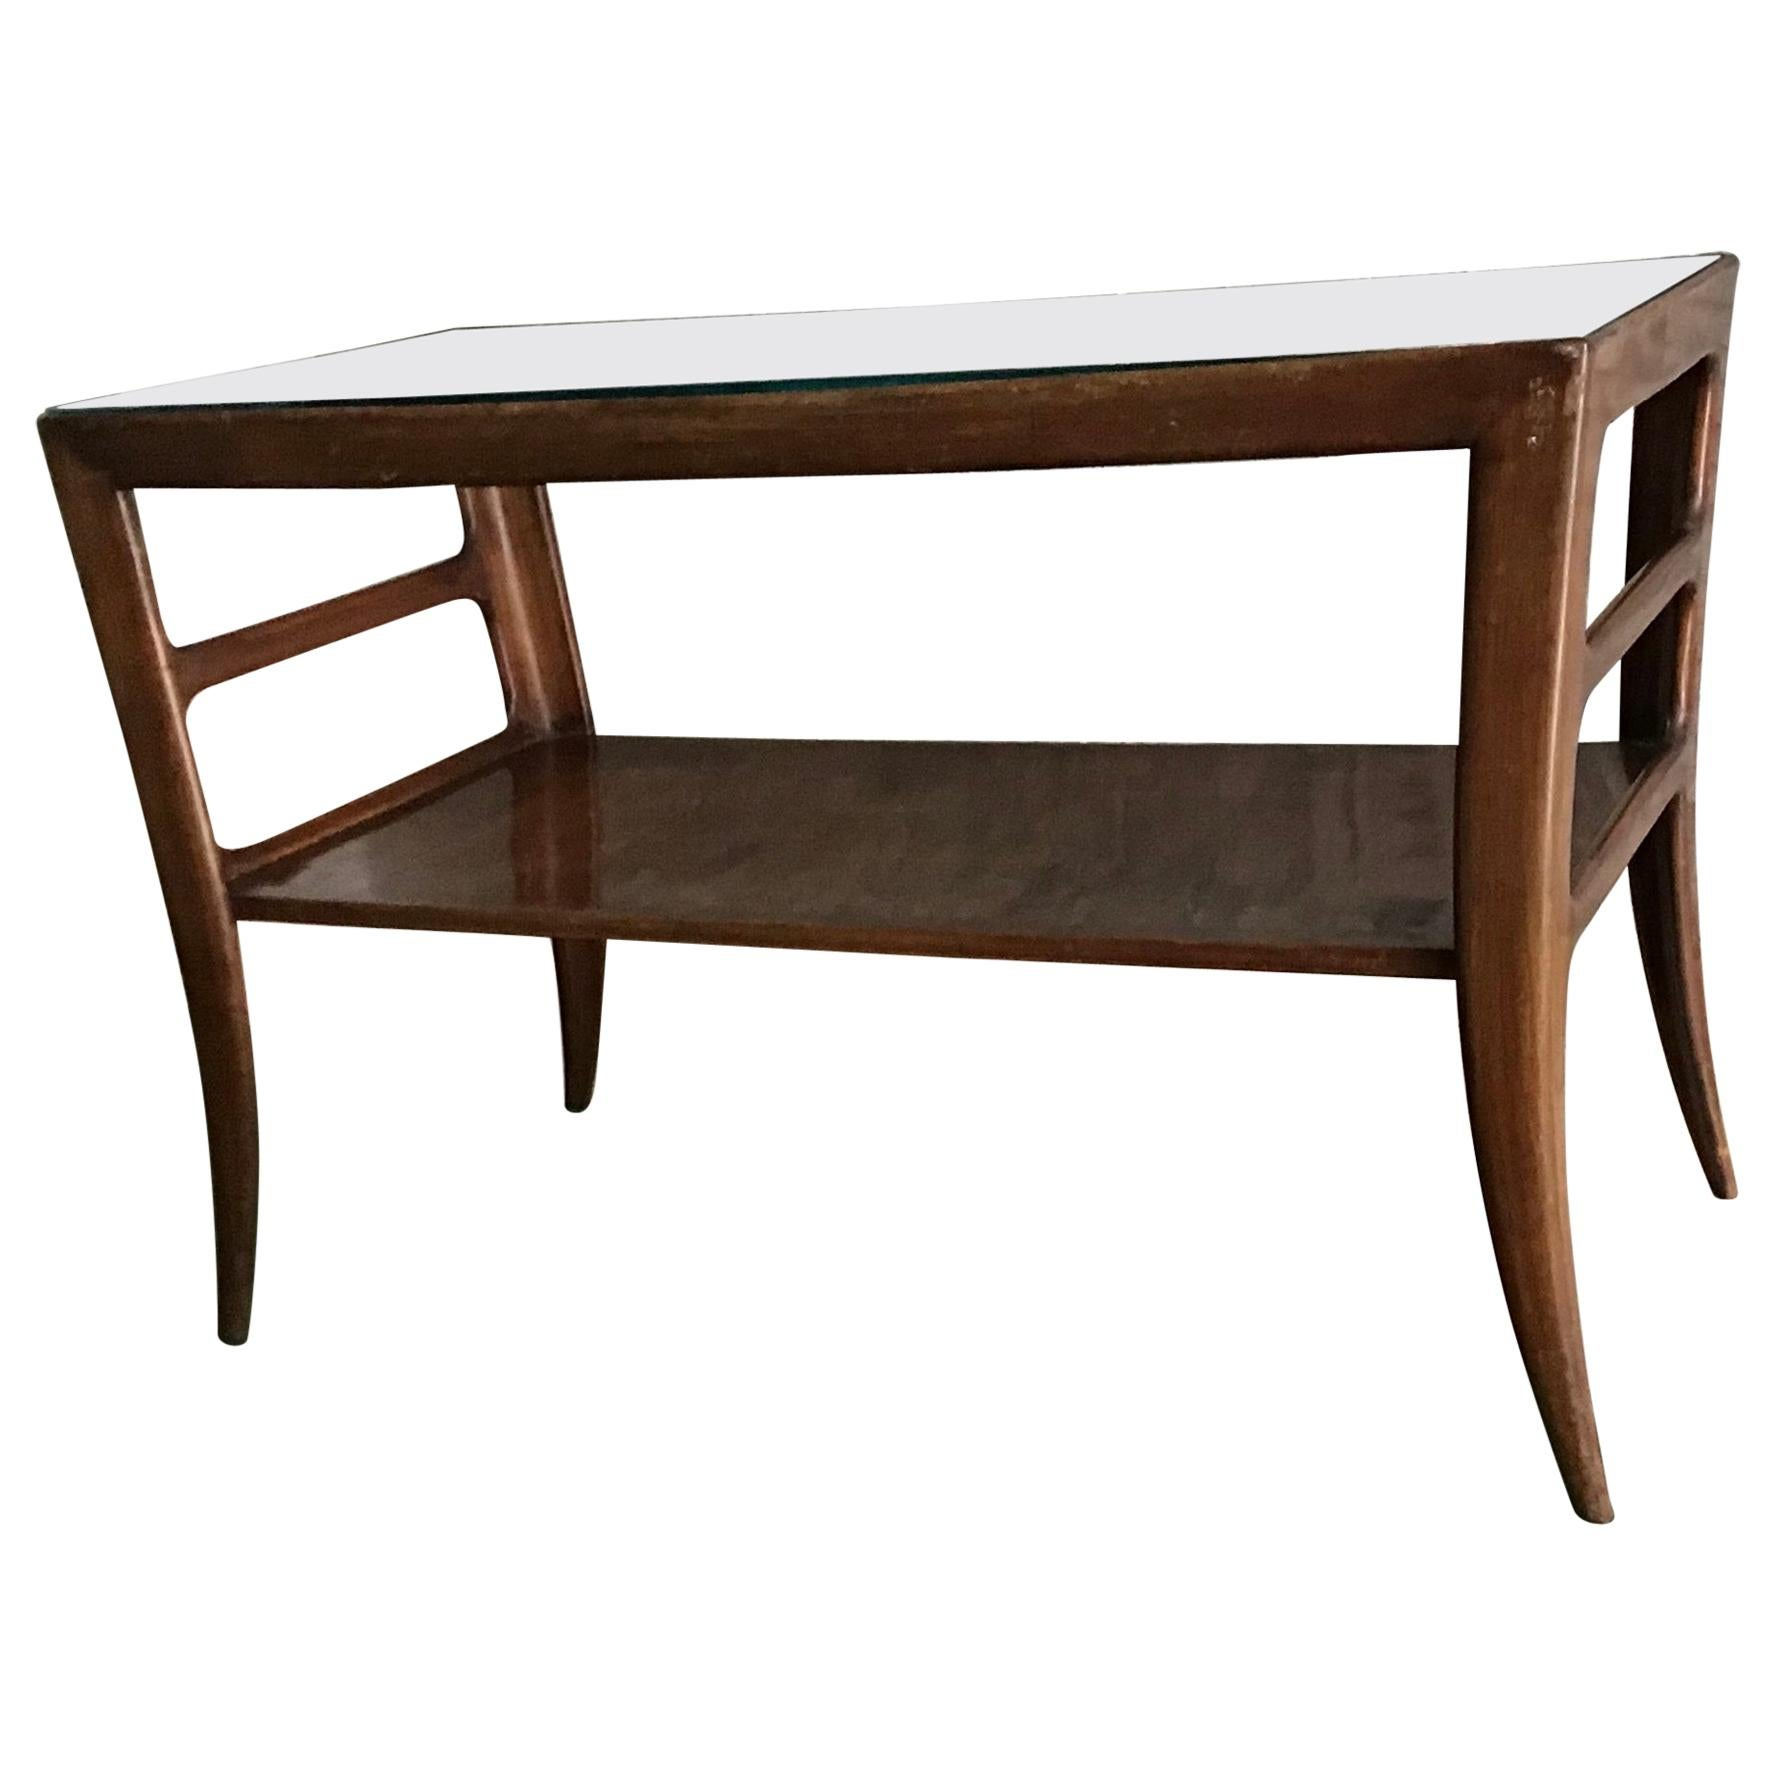 Paolo Buffa Coffee Table Wood Glass 1950, Italy